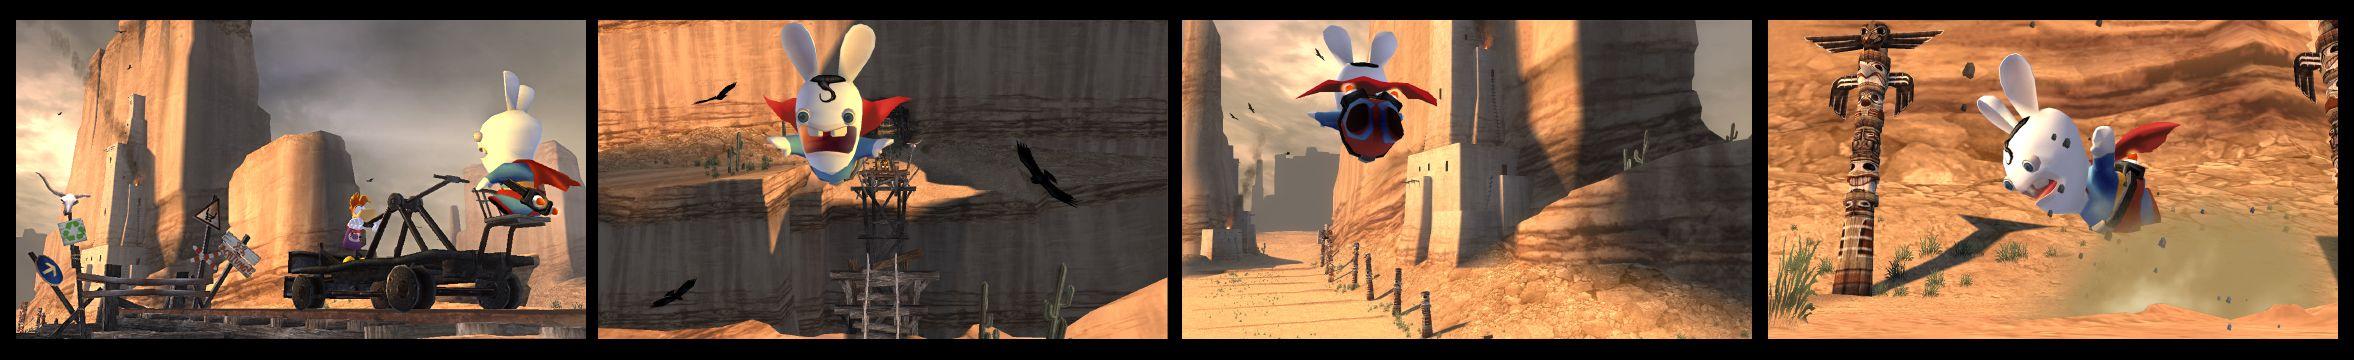 Spieletest: Red Steel, Rayman & Co - Neues Wii-Futter